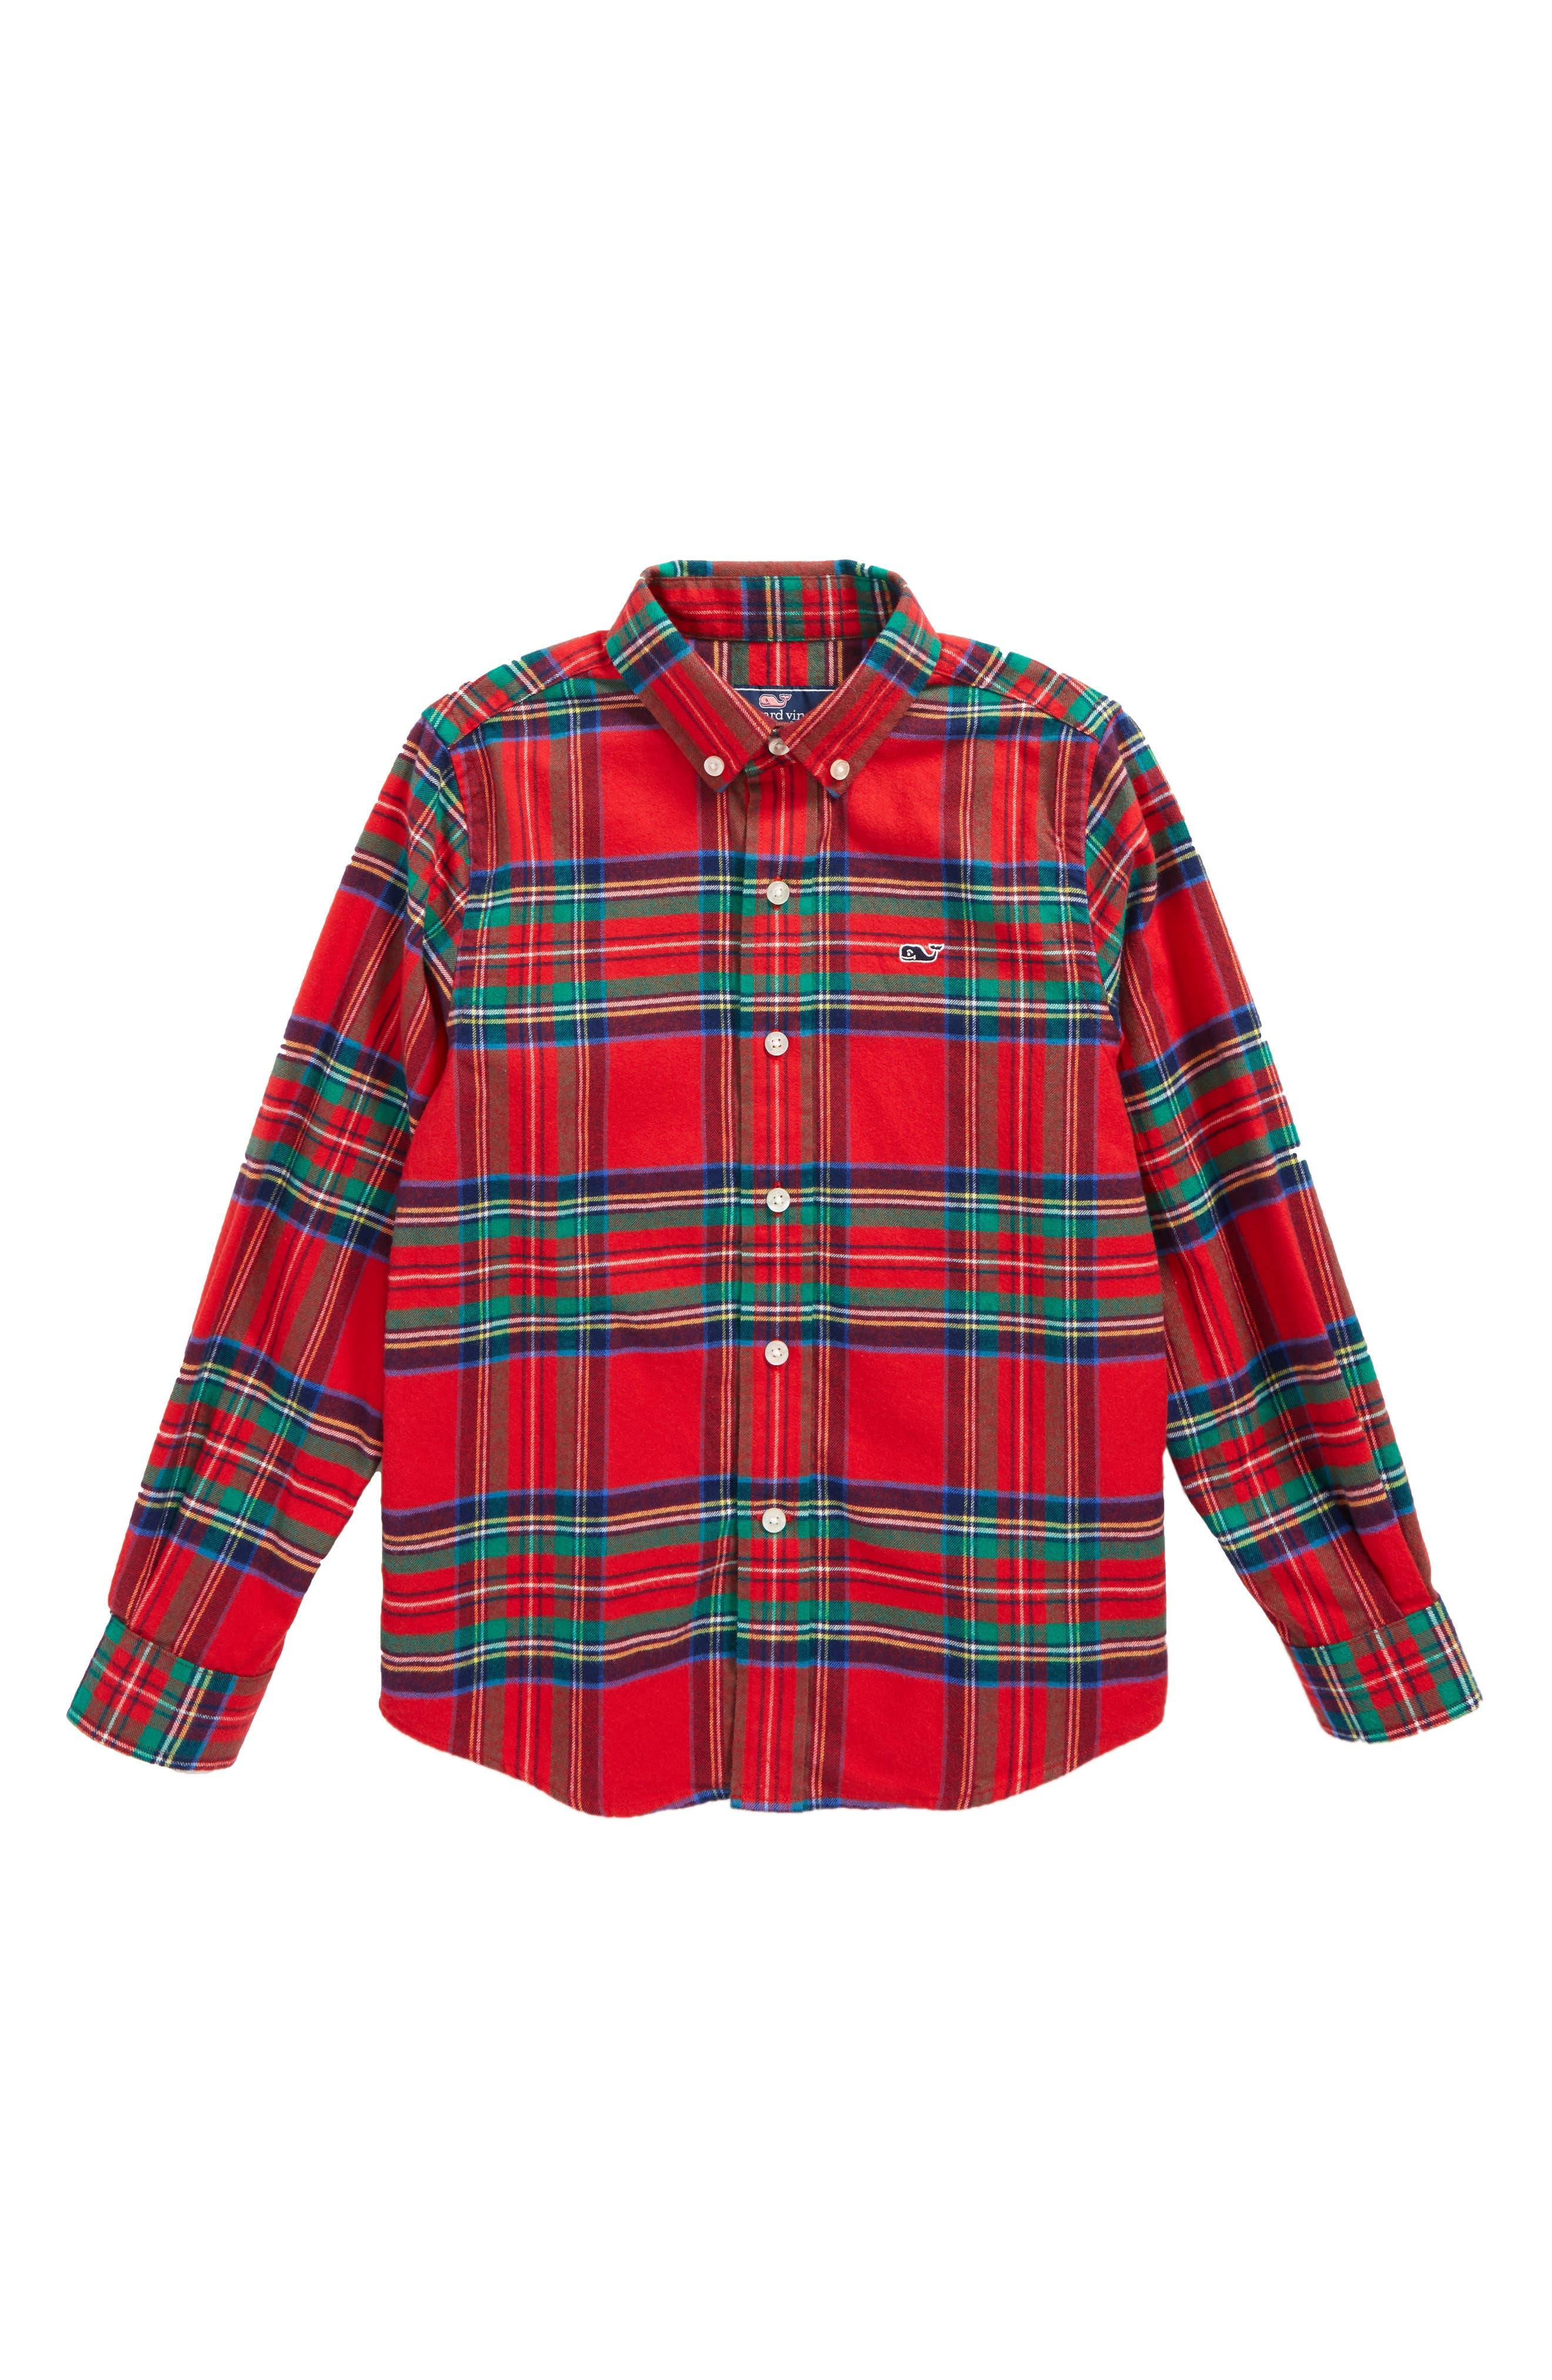 Main Image - vineyard vines Jolly Plaid Whale Flannel Shirt (Toddler Boys & Little Boys)